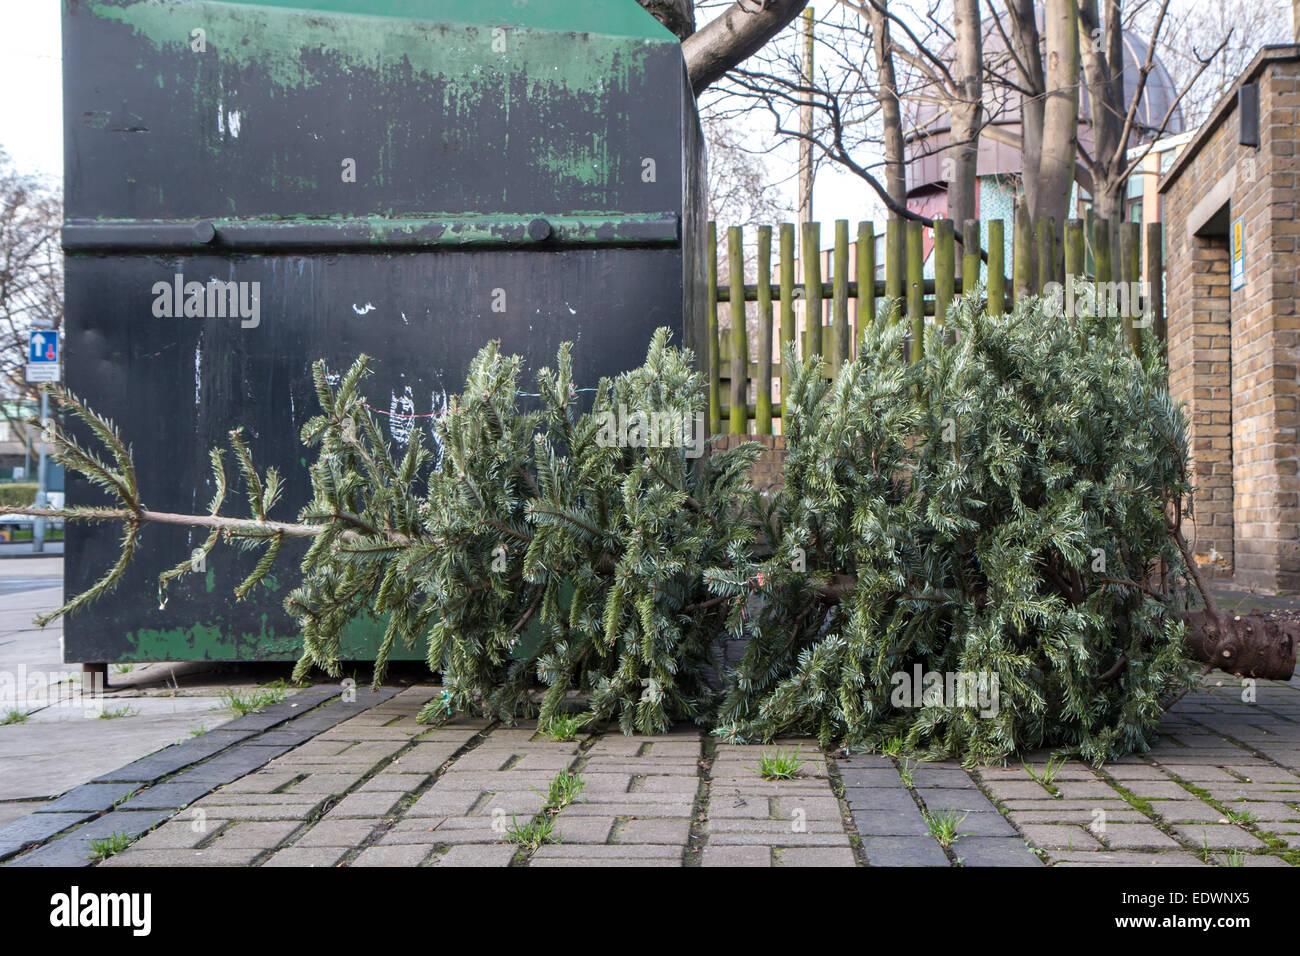 Abandoned Christmas tree - Stock Image